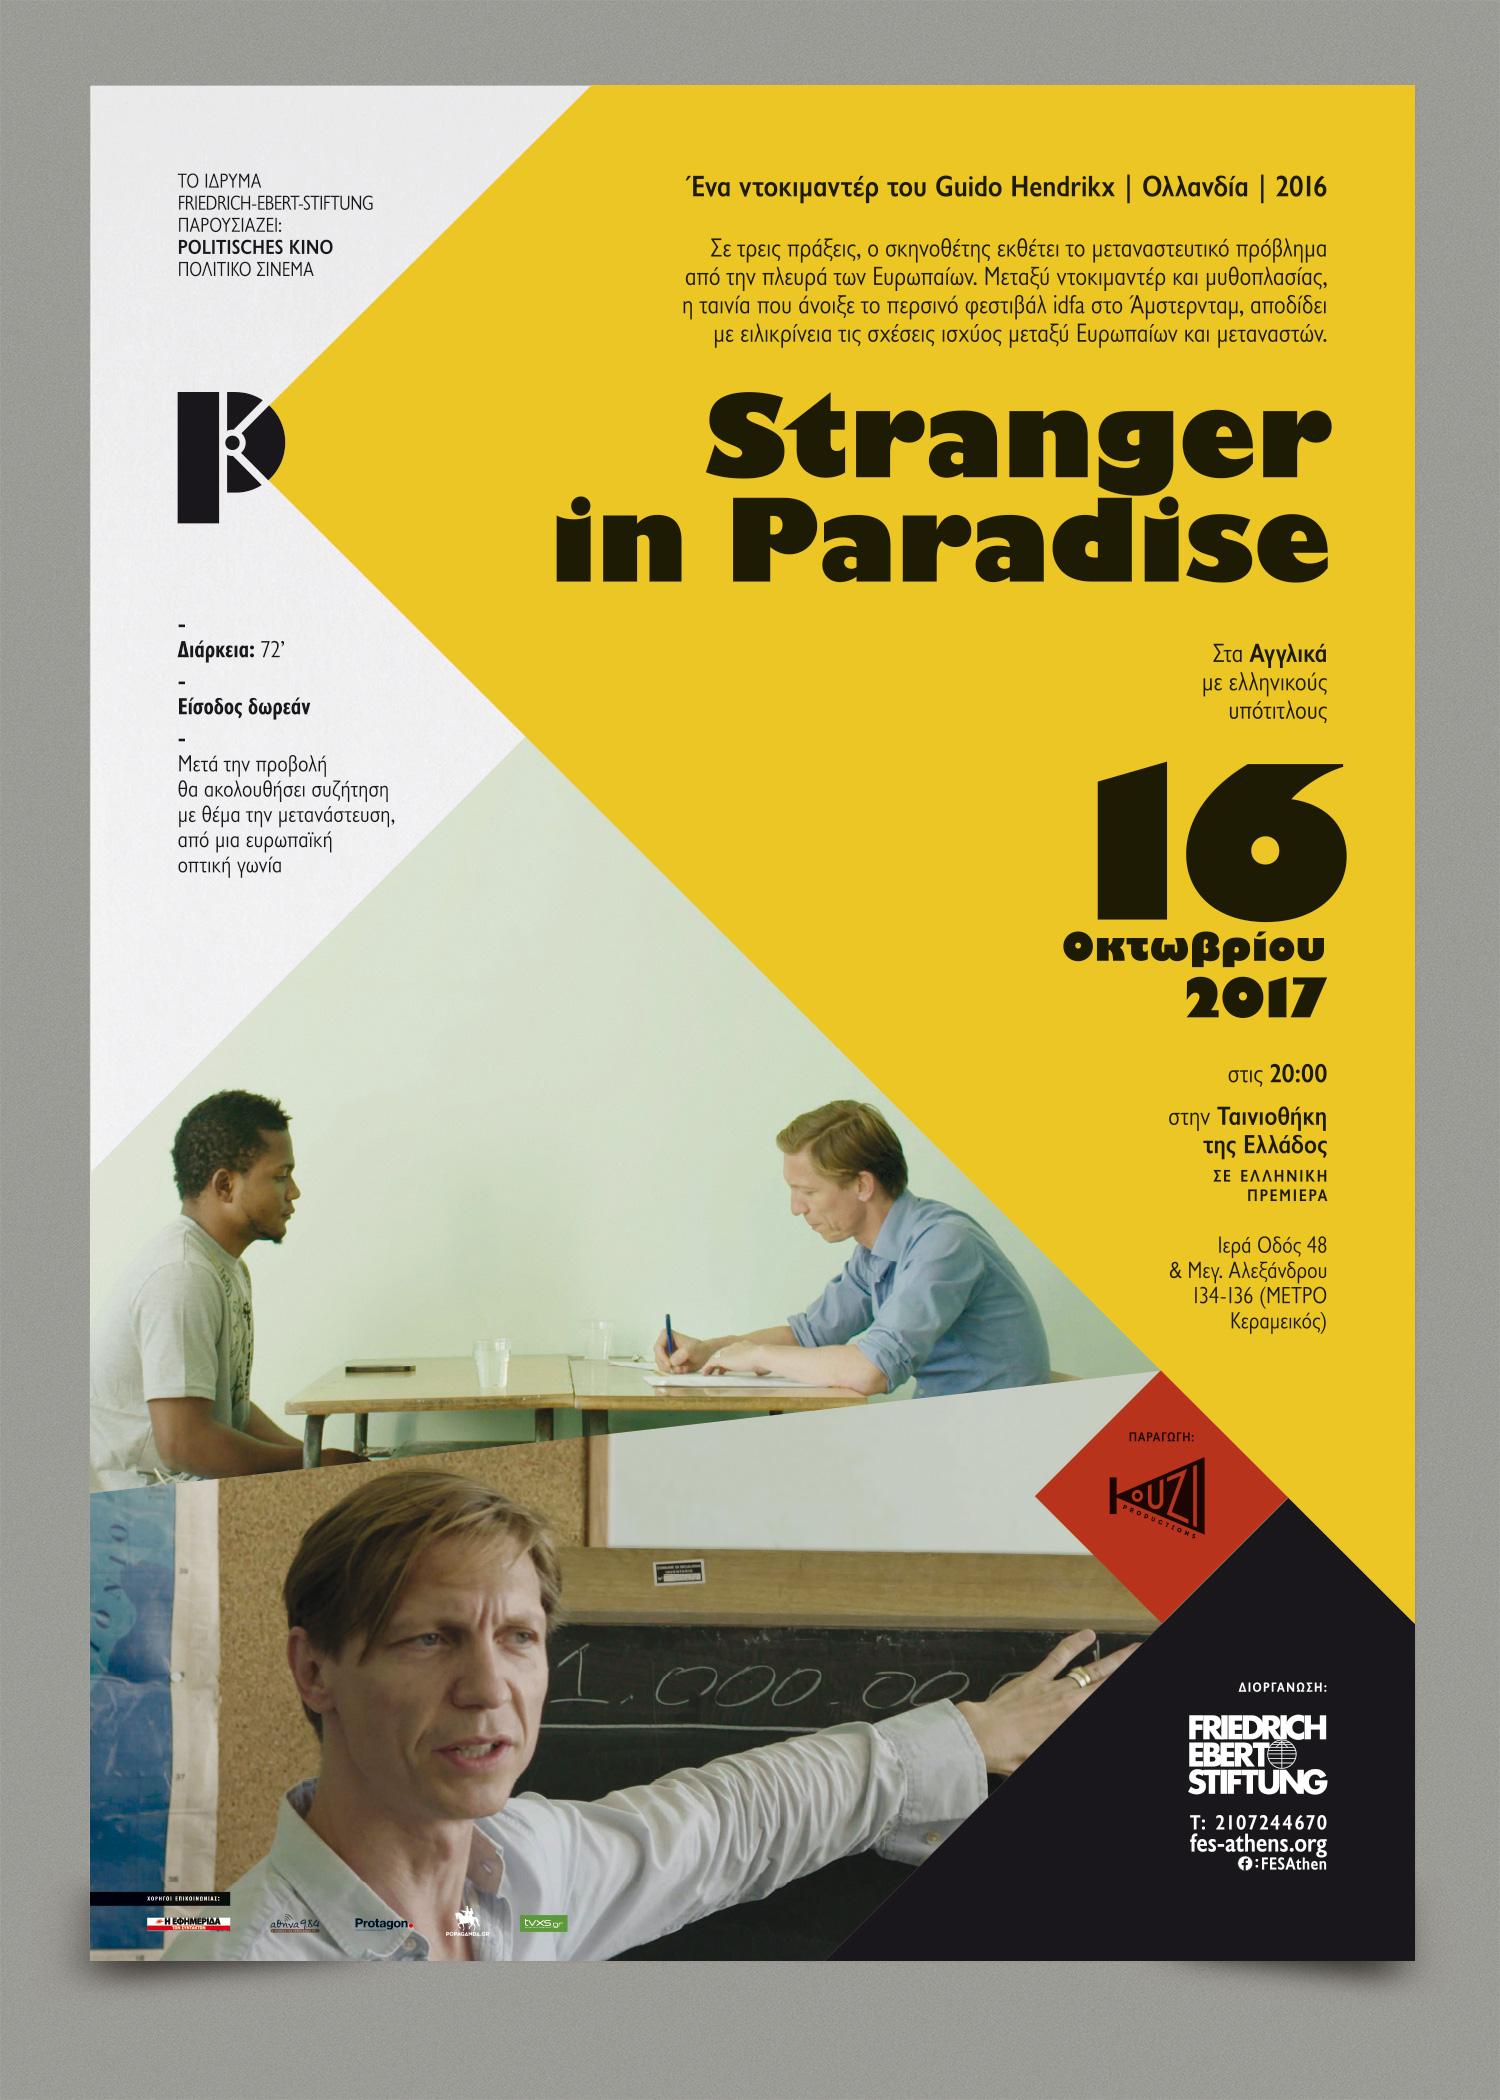 Politisches Kino poster by zazdesign